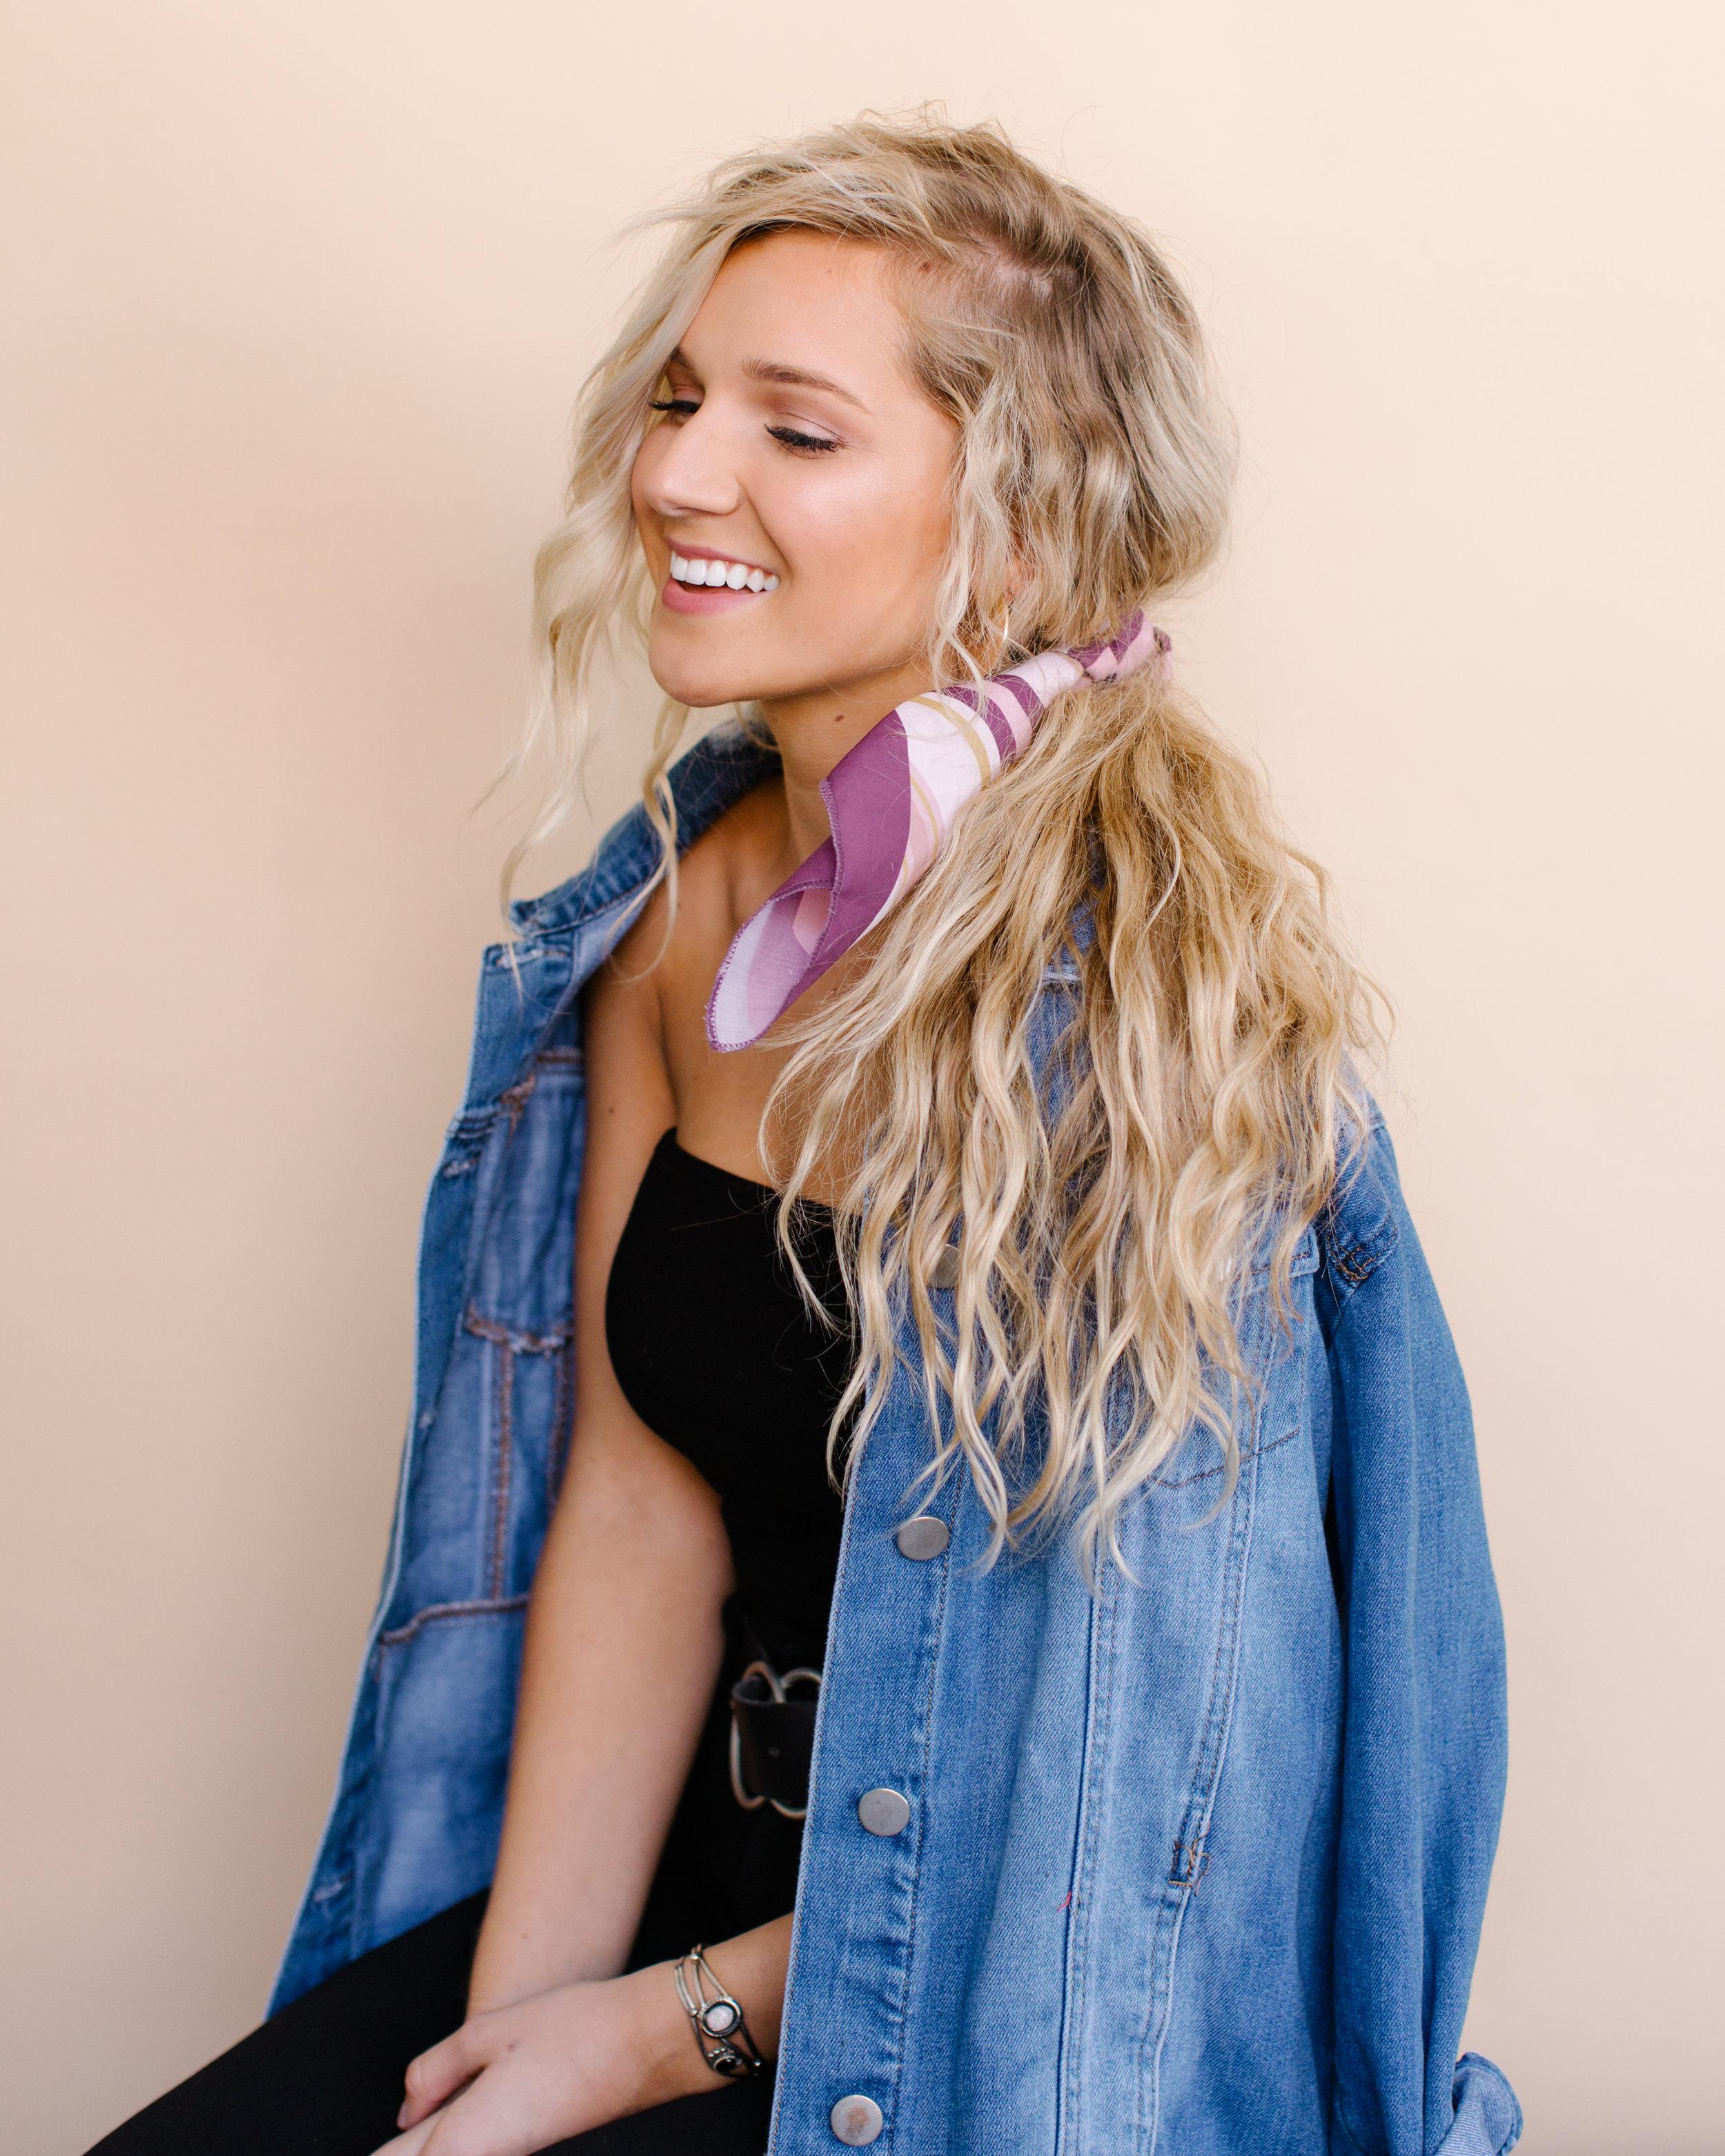 Tossd  Photographer: Hunter Fowler  Model: Virginia Hunsaker  Hair, Makeup, Wardrobe: Abigail Hill